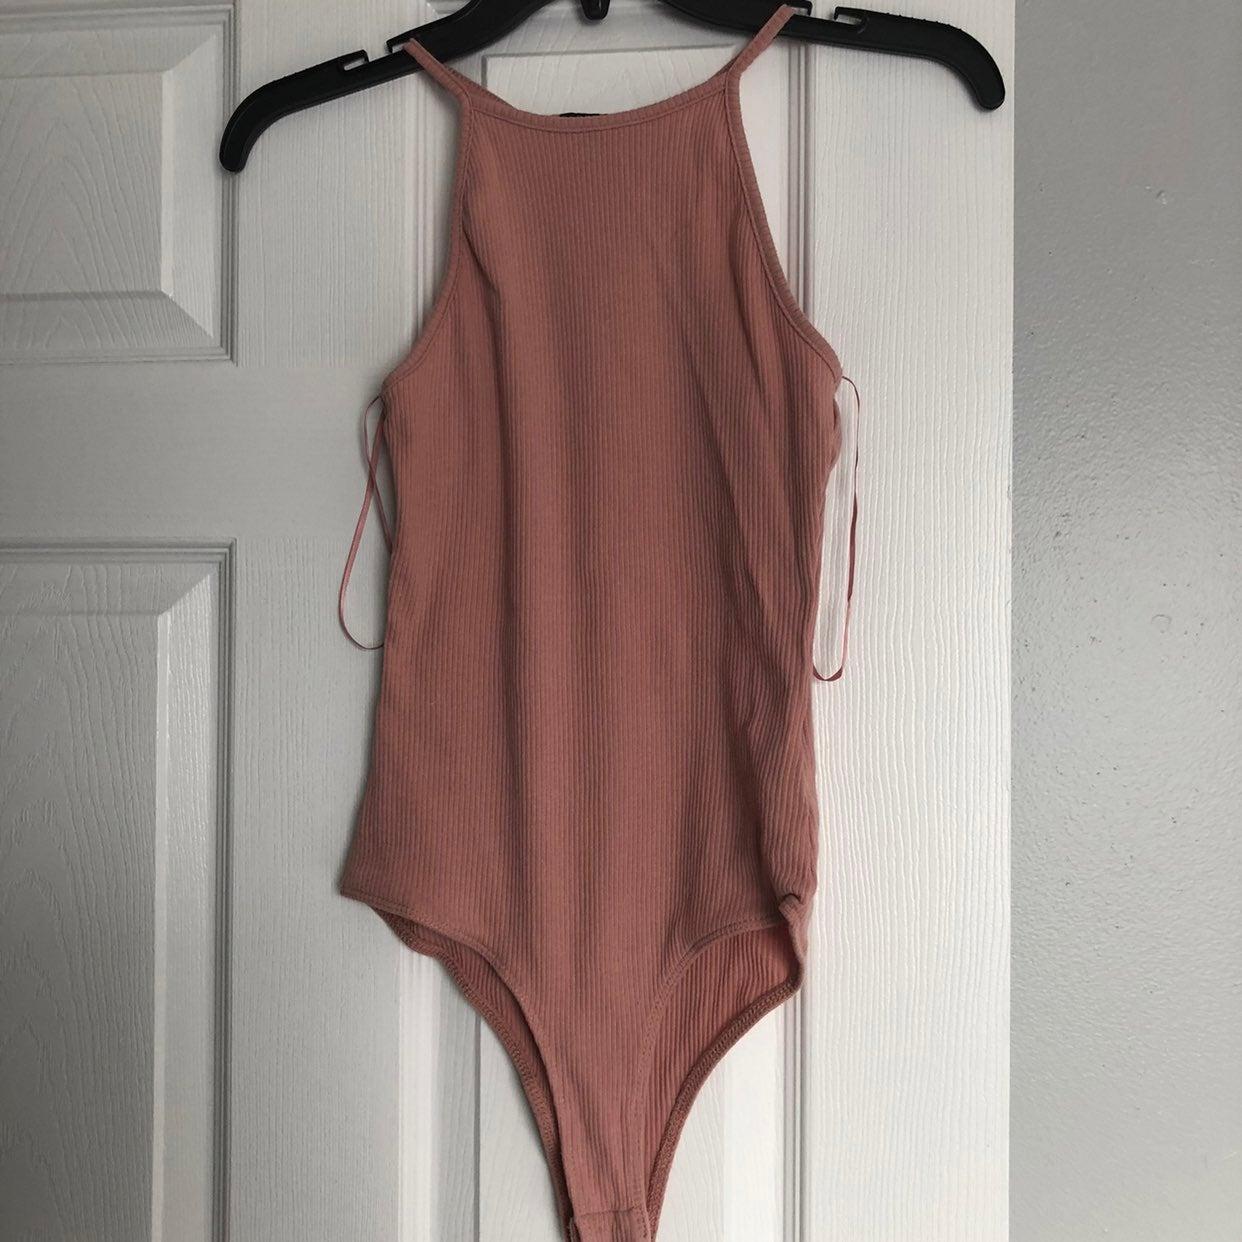 Ambiance Bodysuit